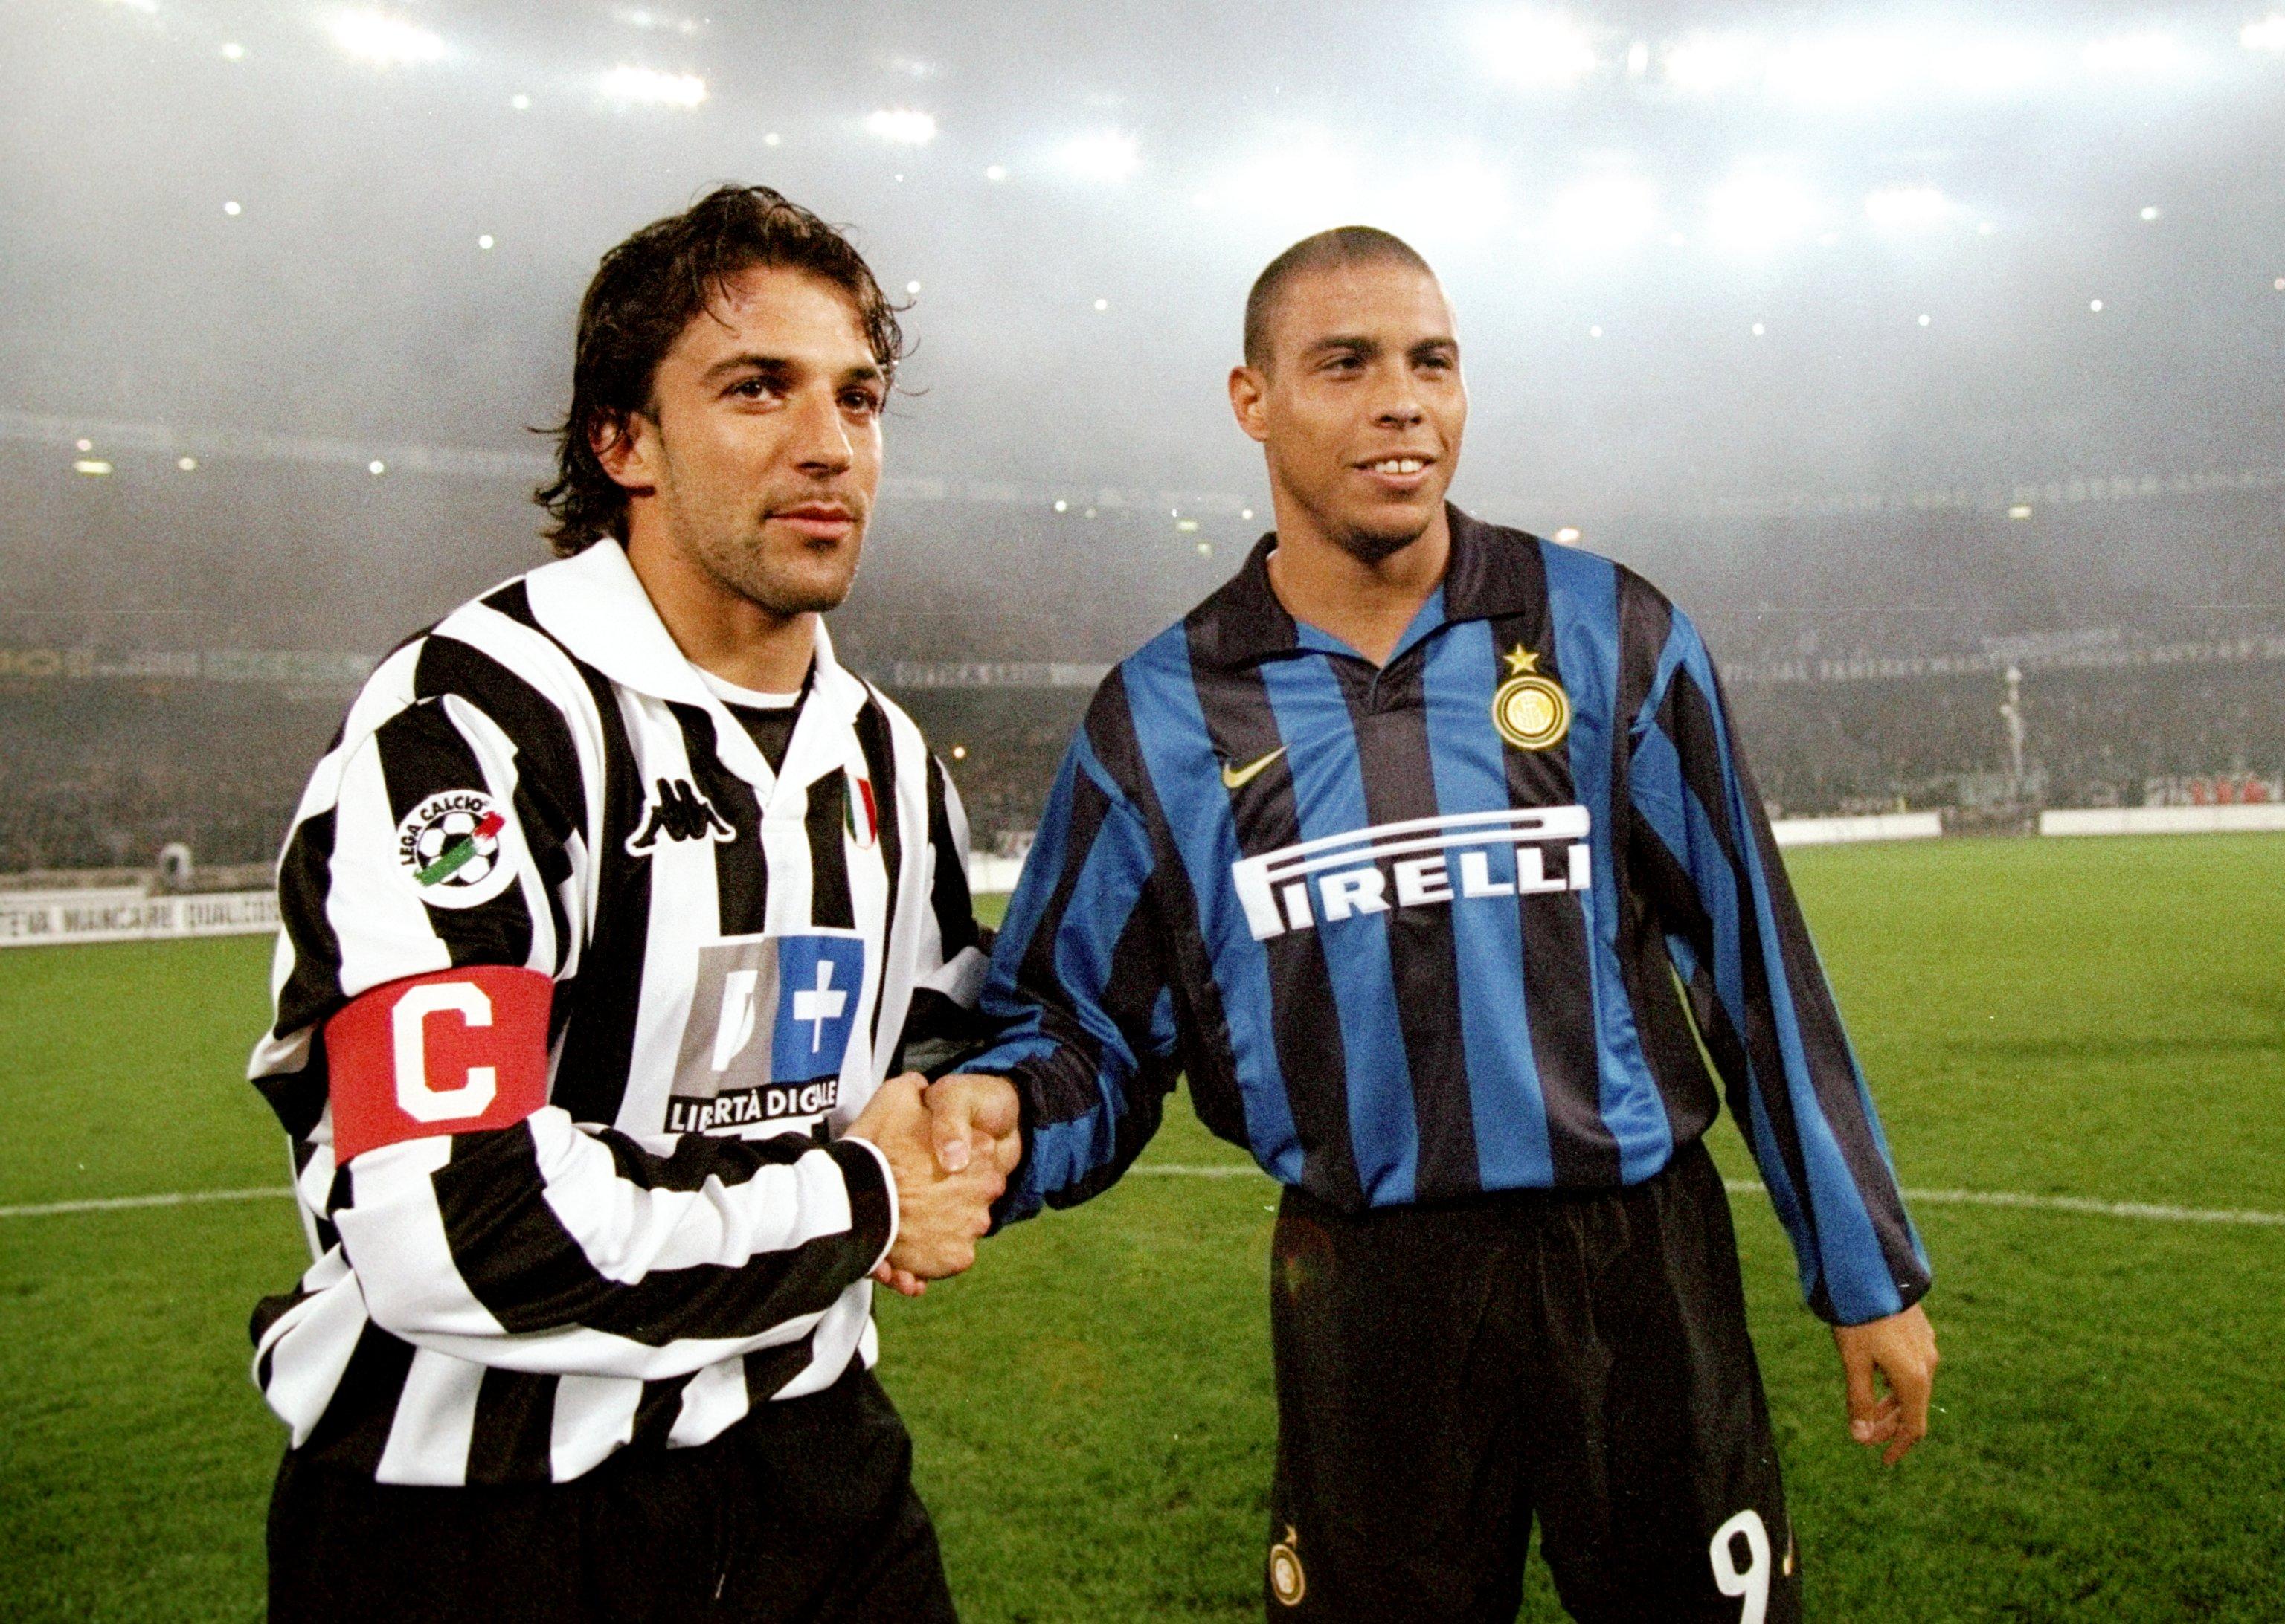 Ronaldo of Inter Milan and Alessandro Del Piero of Juventus